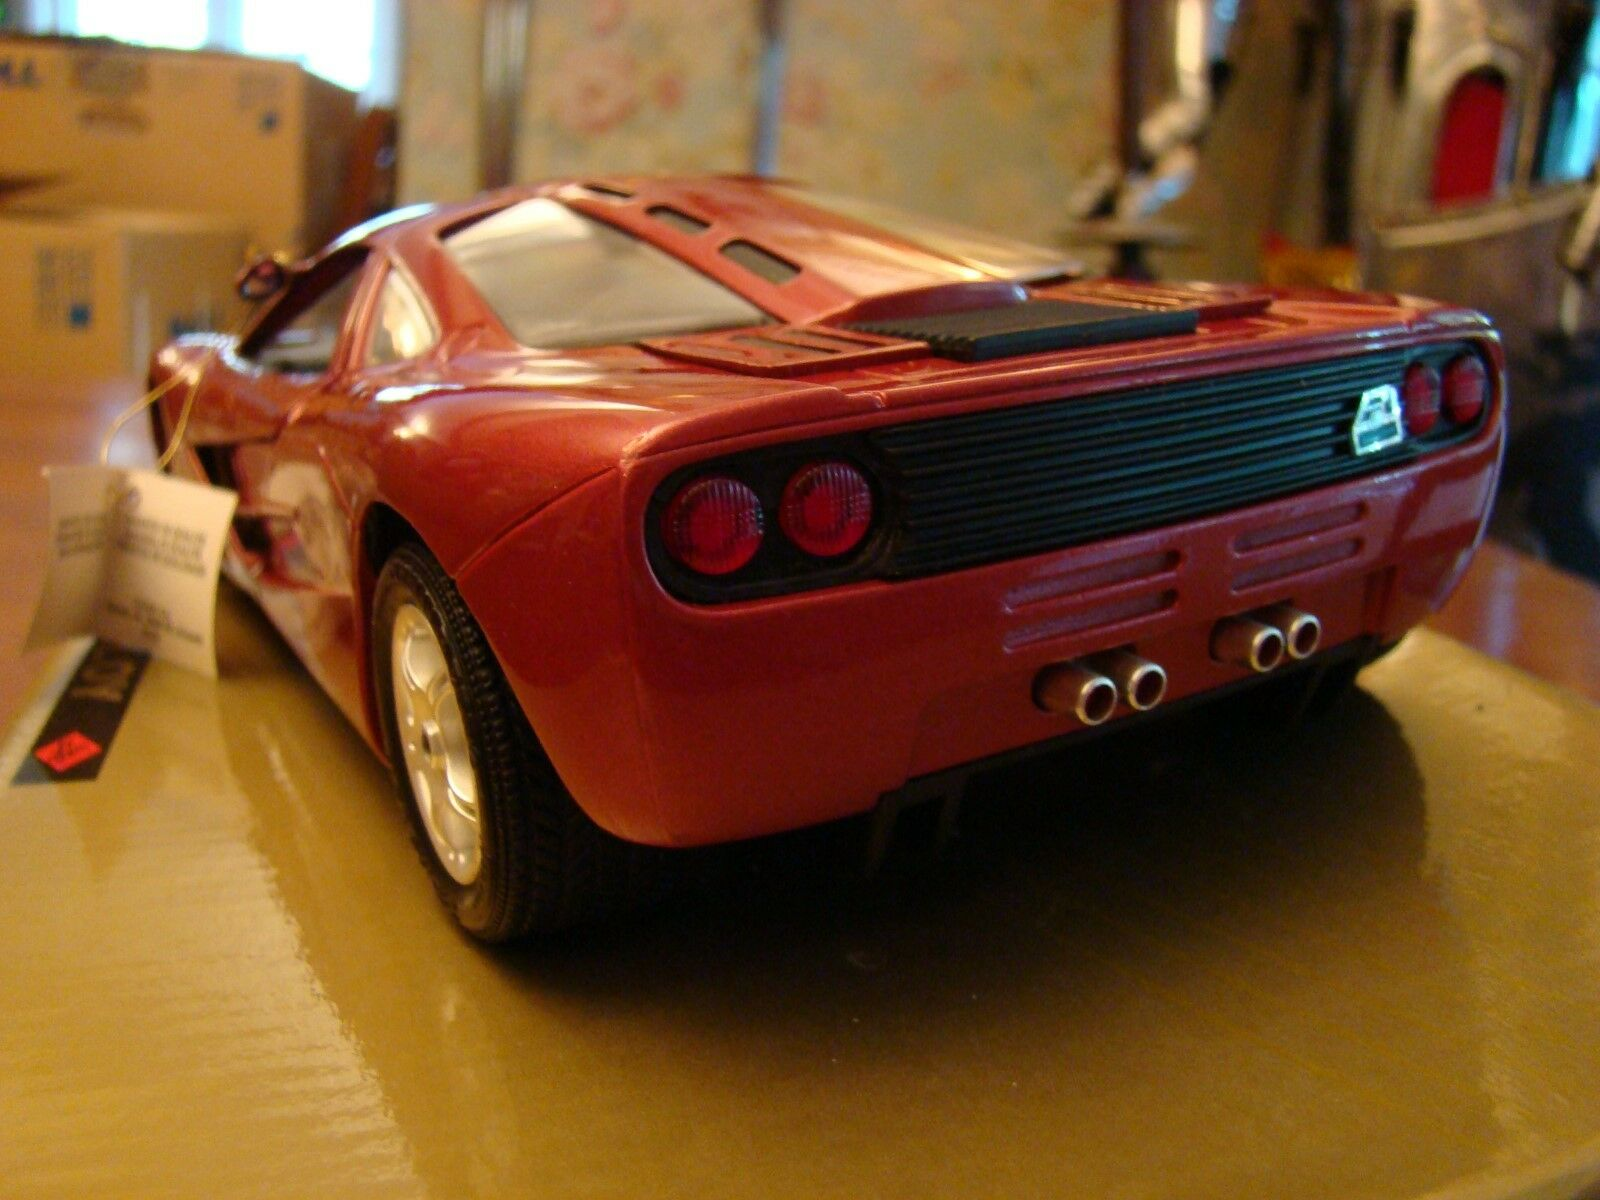 1 18 McLaren F1 F1 F1 6.1 Litro BMW V12 Super Coupe Rubí Perla Rara 8658d4